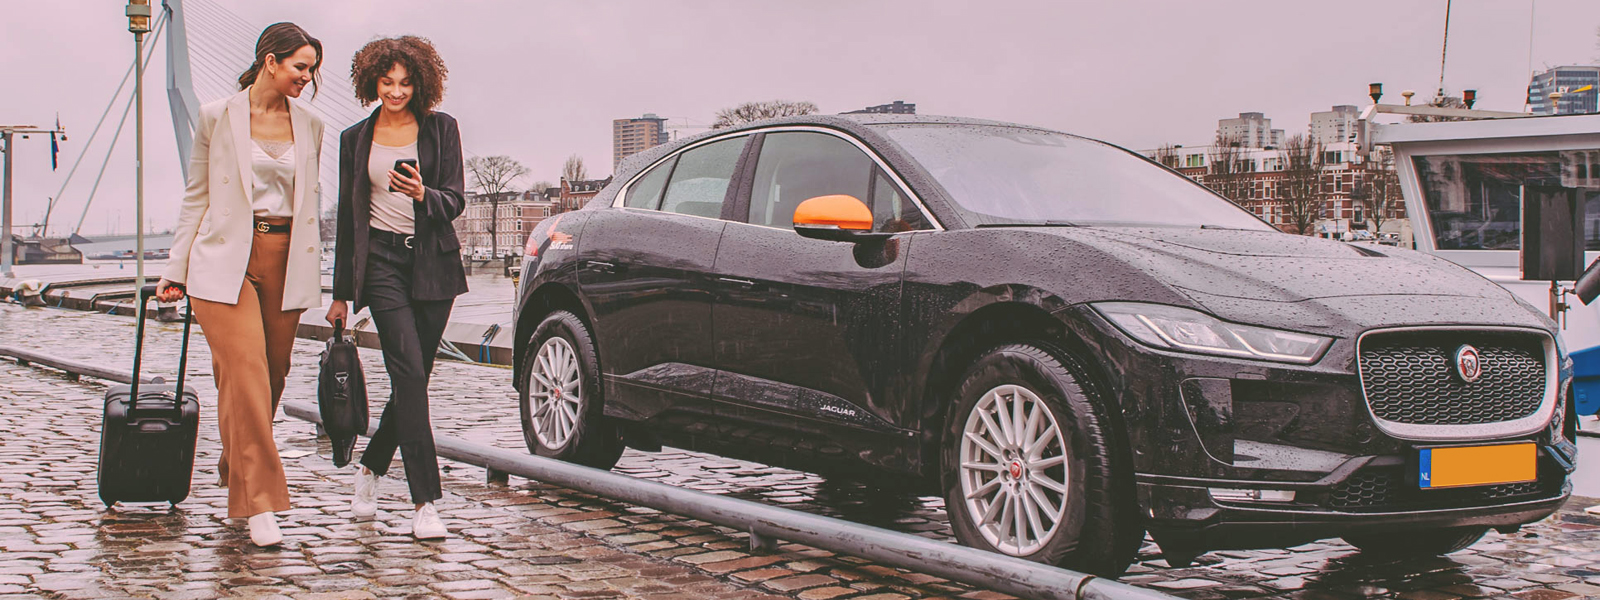 sixt share carsharing in rotterdam erasmusbrug